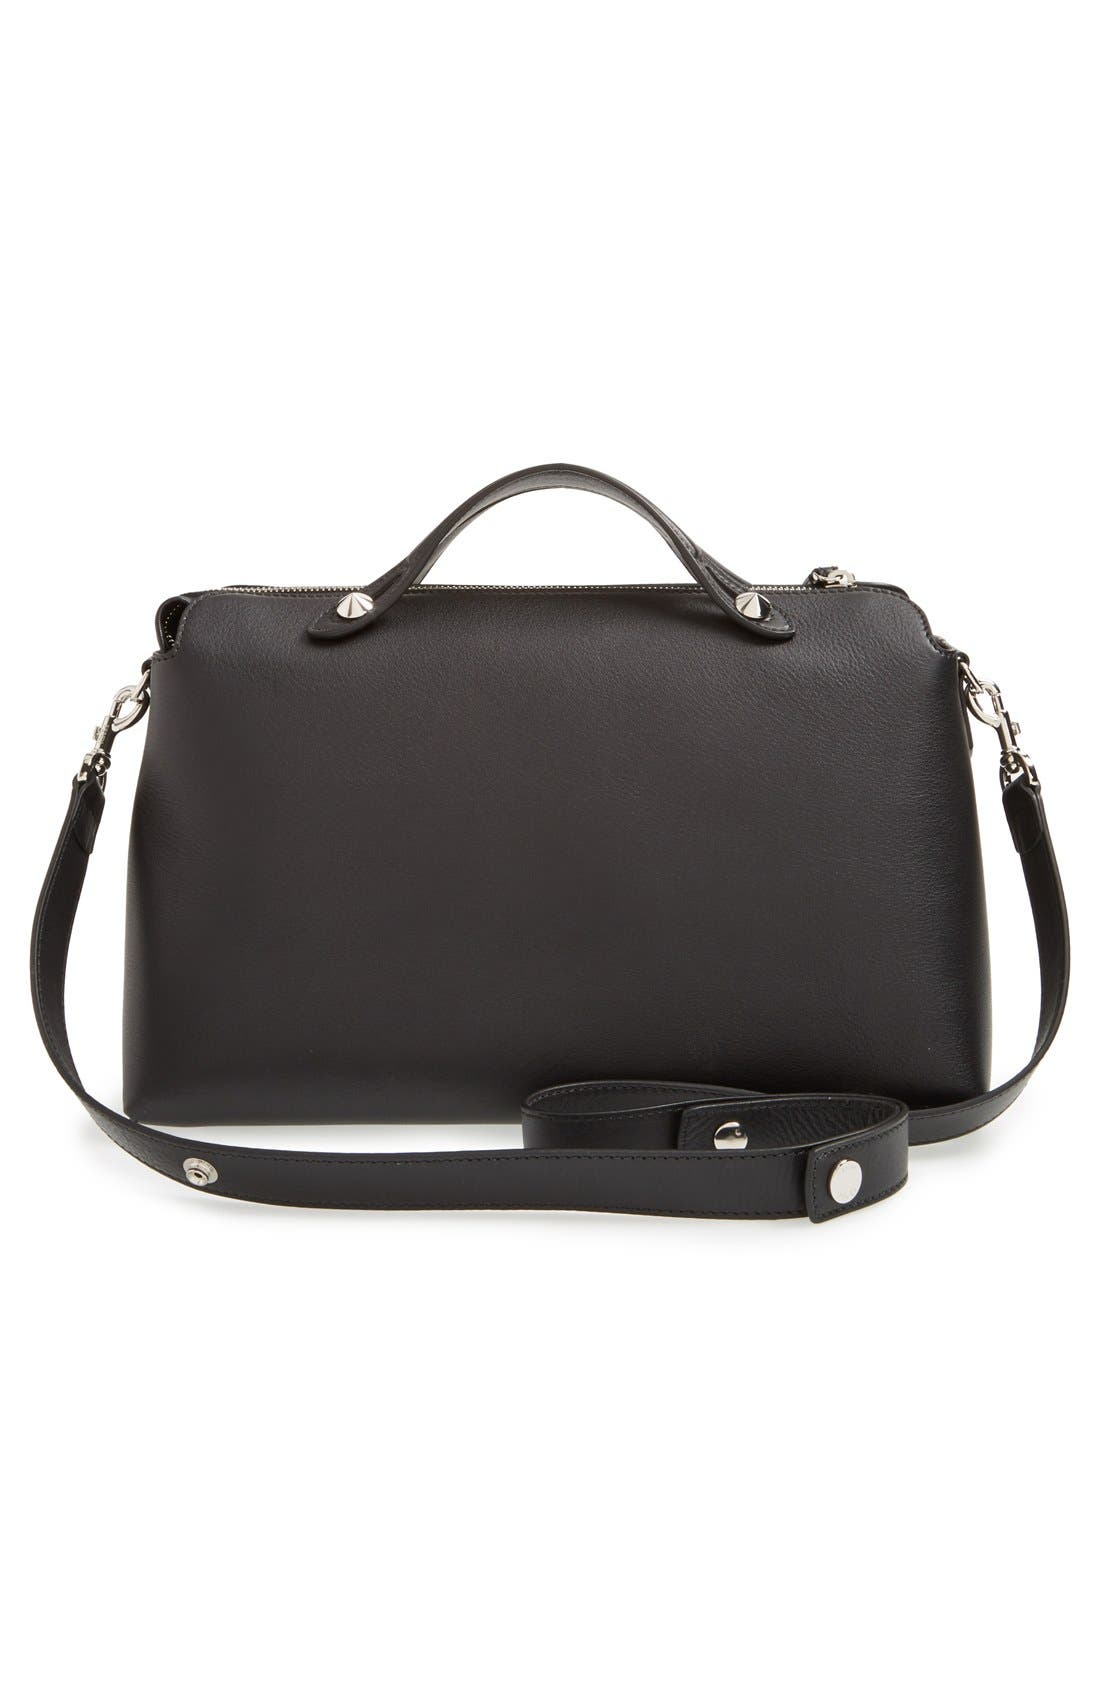 Alternate Image 3  - Fendi Large by the Way Leather Shoulder Bag